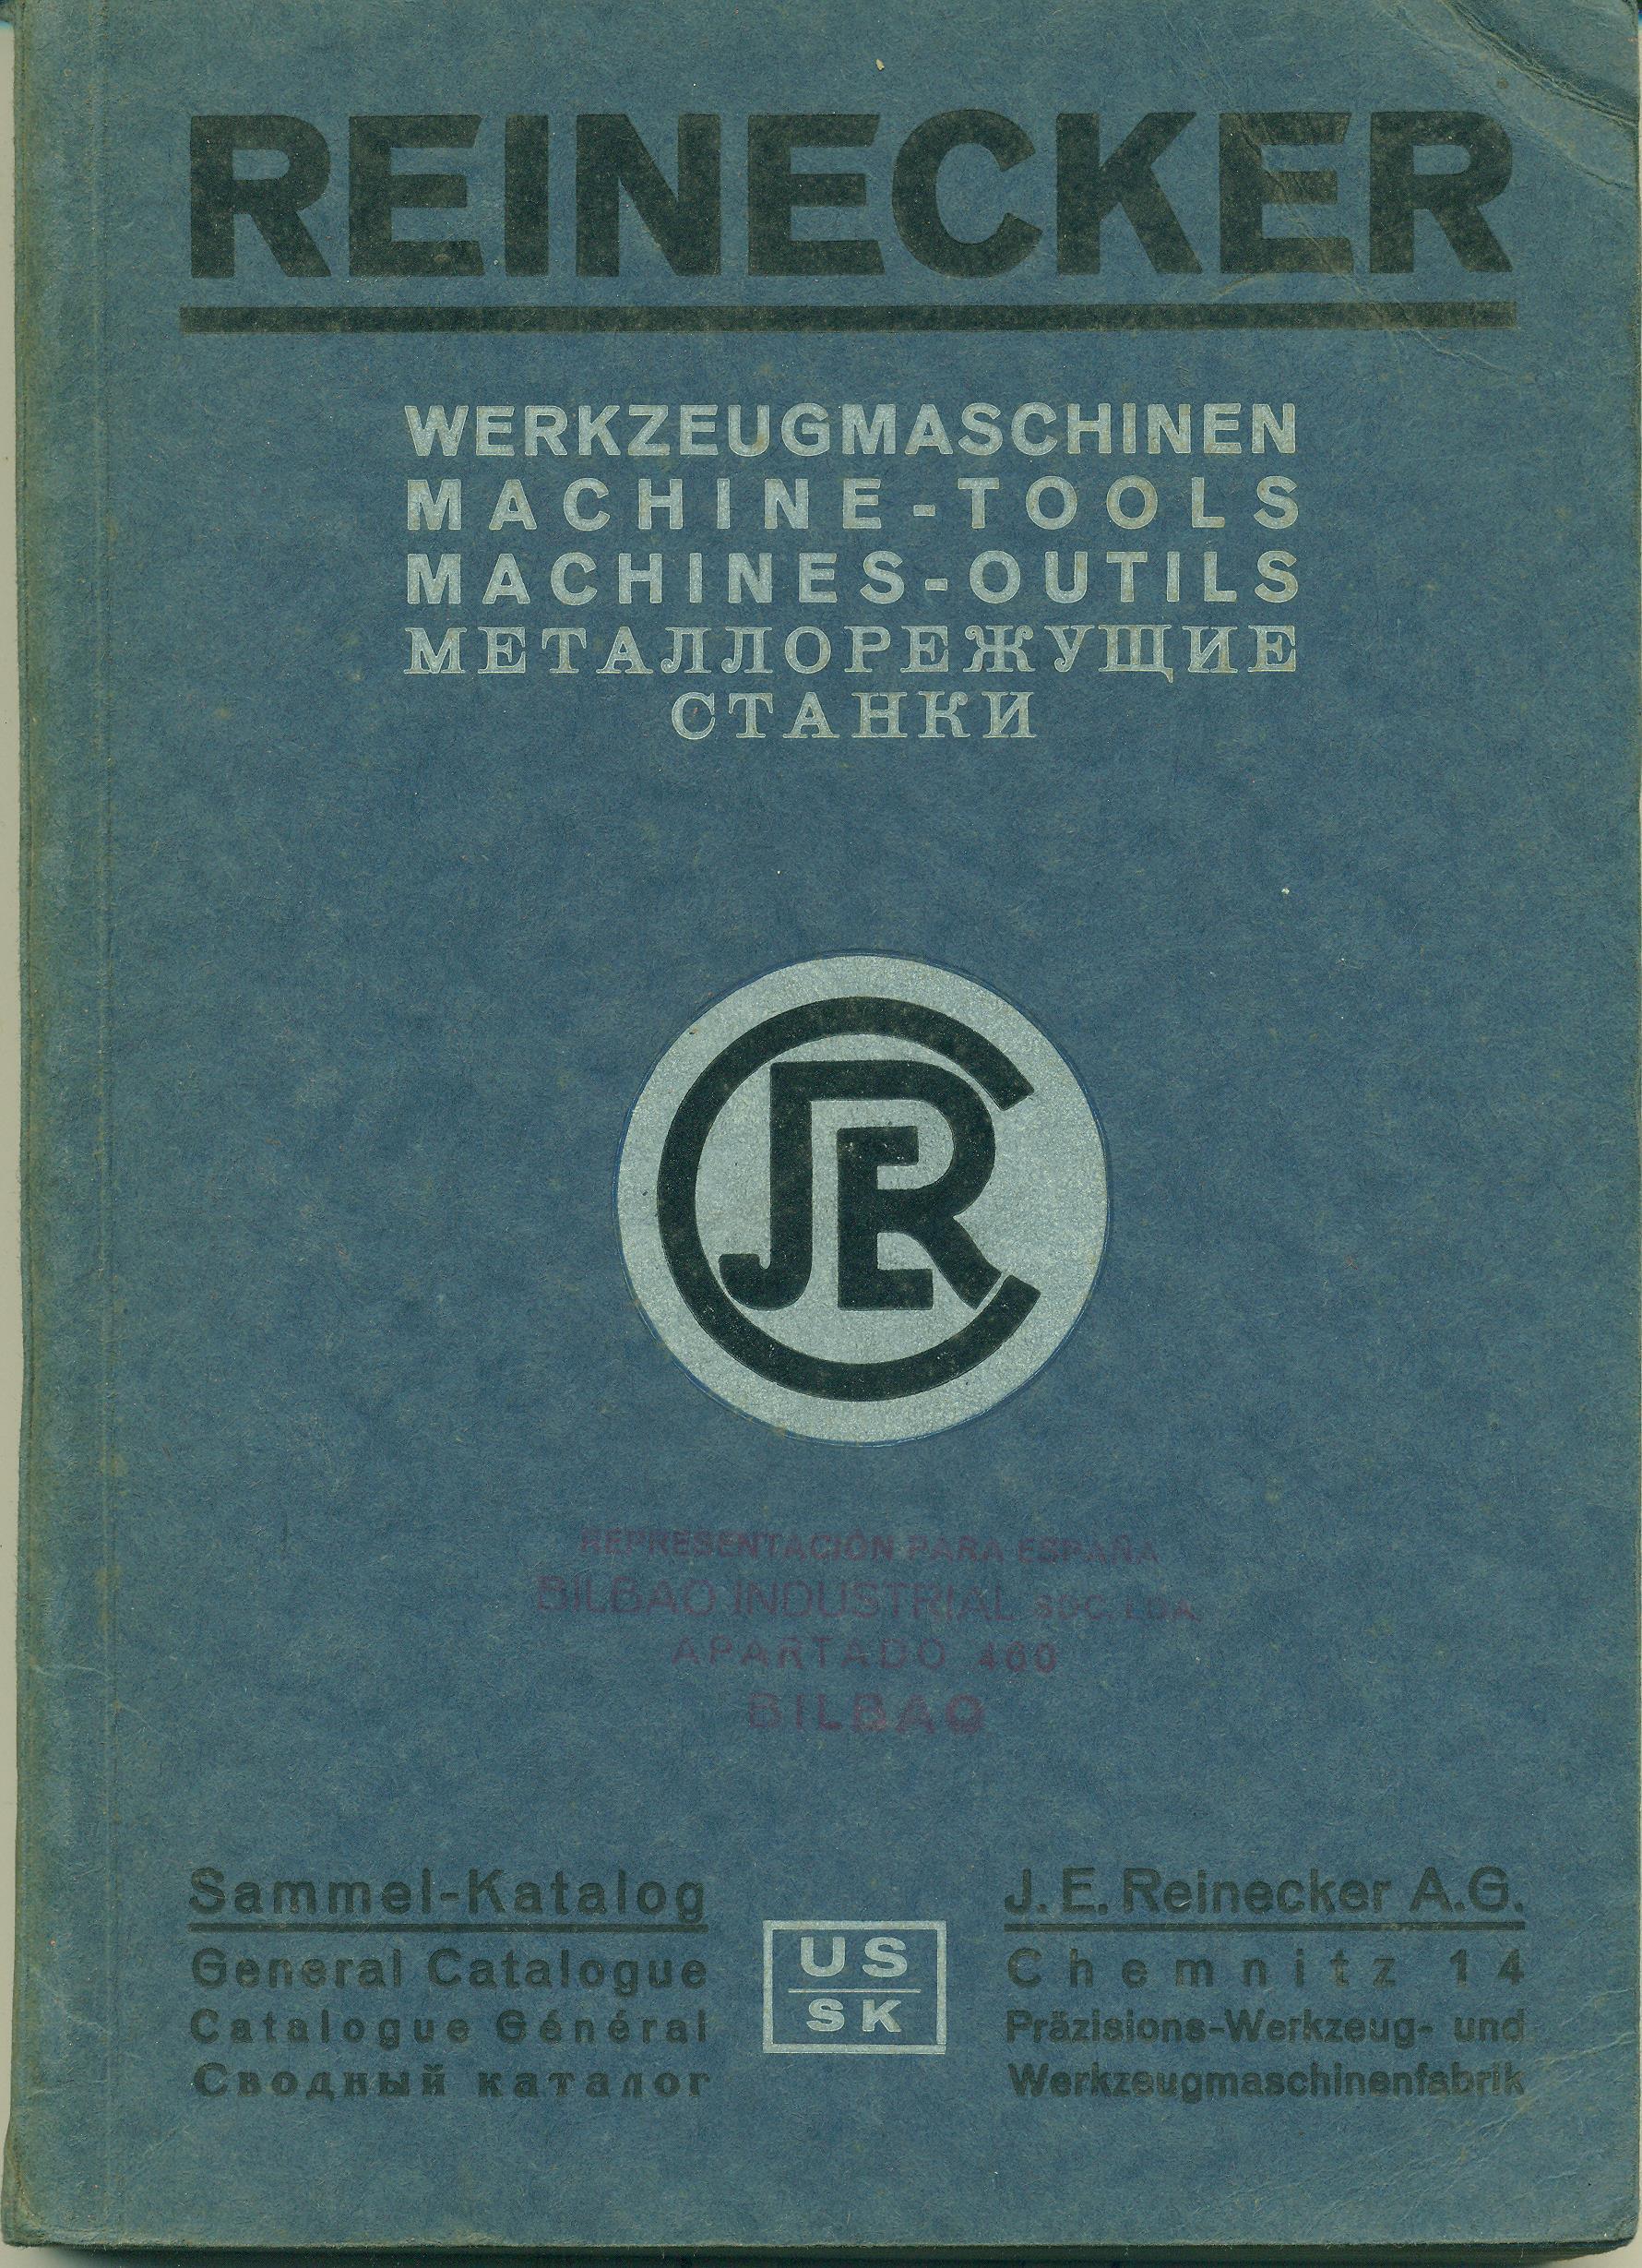 J. E. REINECKER A.-G. (Empresa)